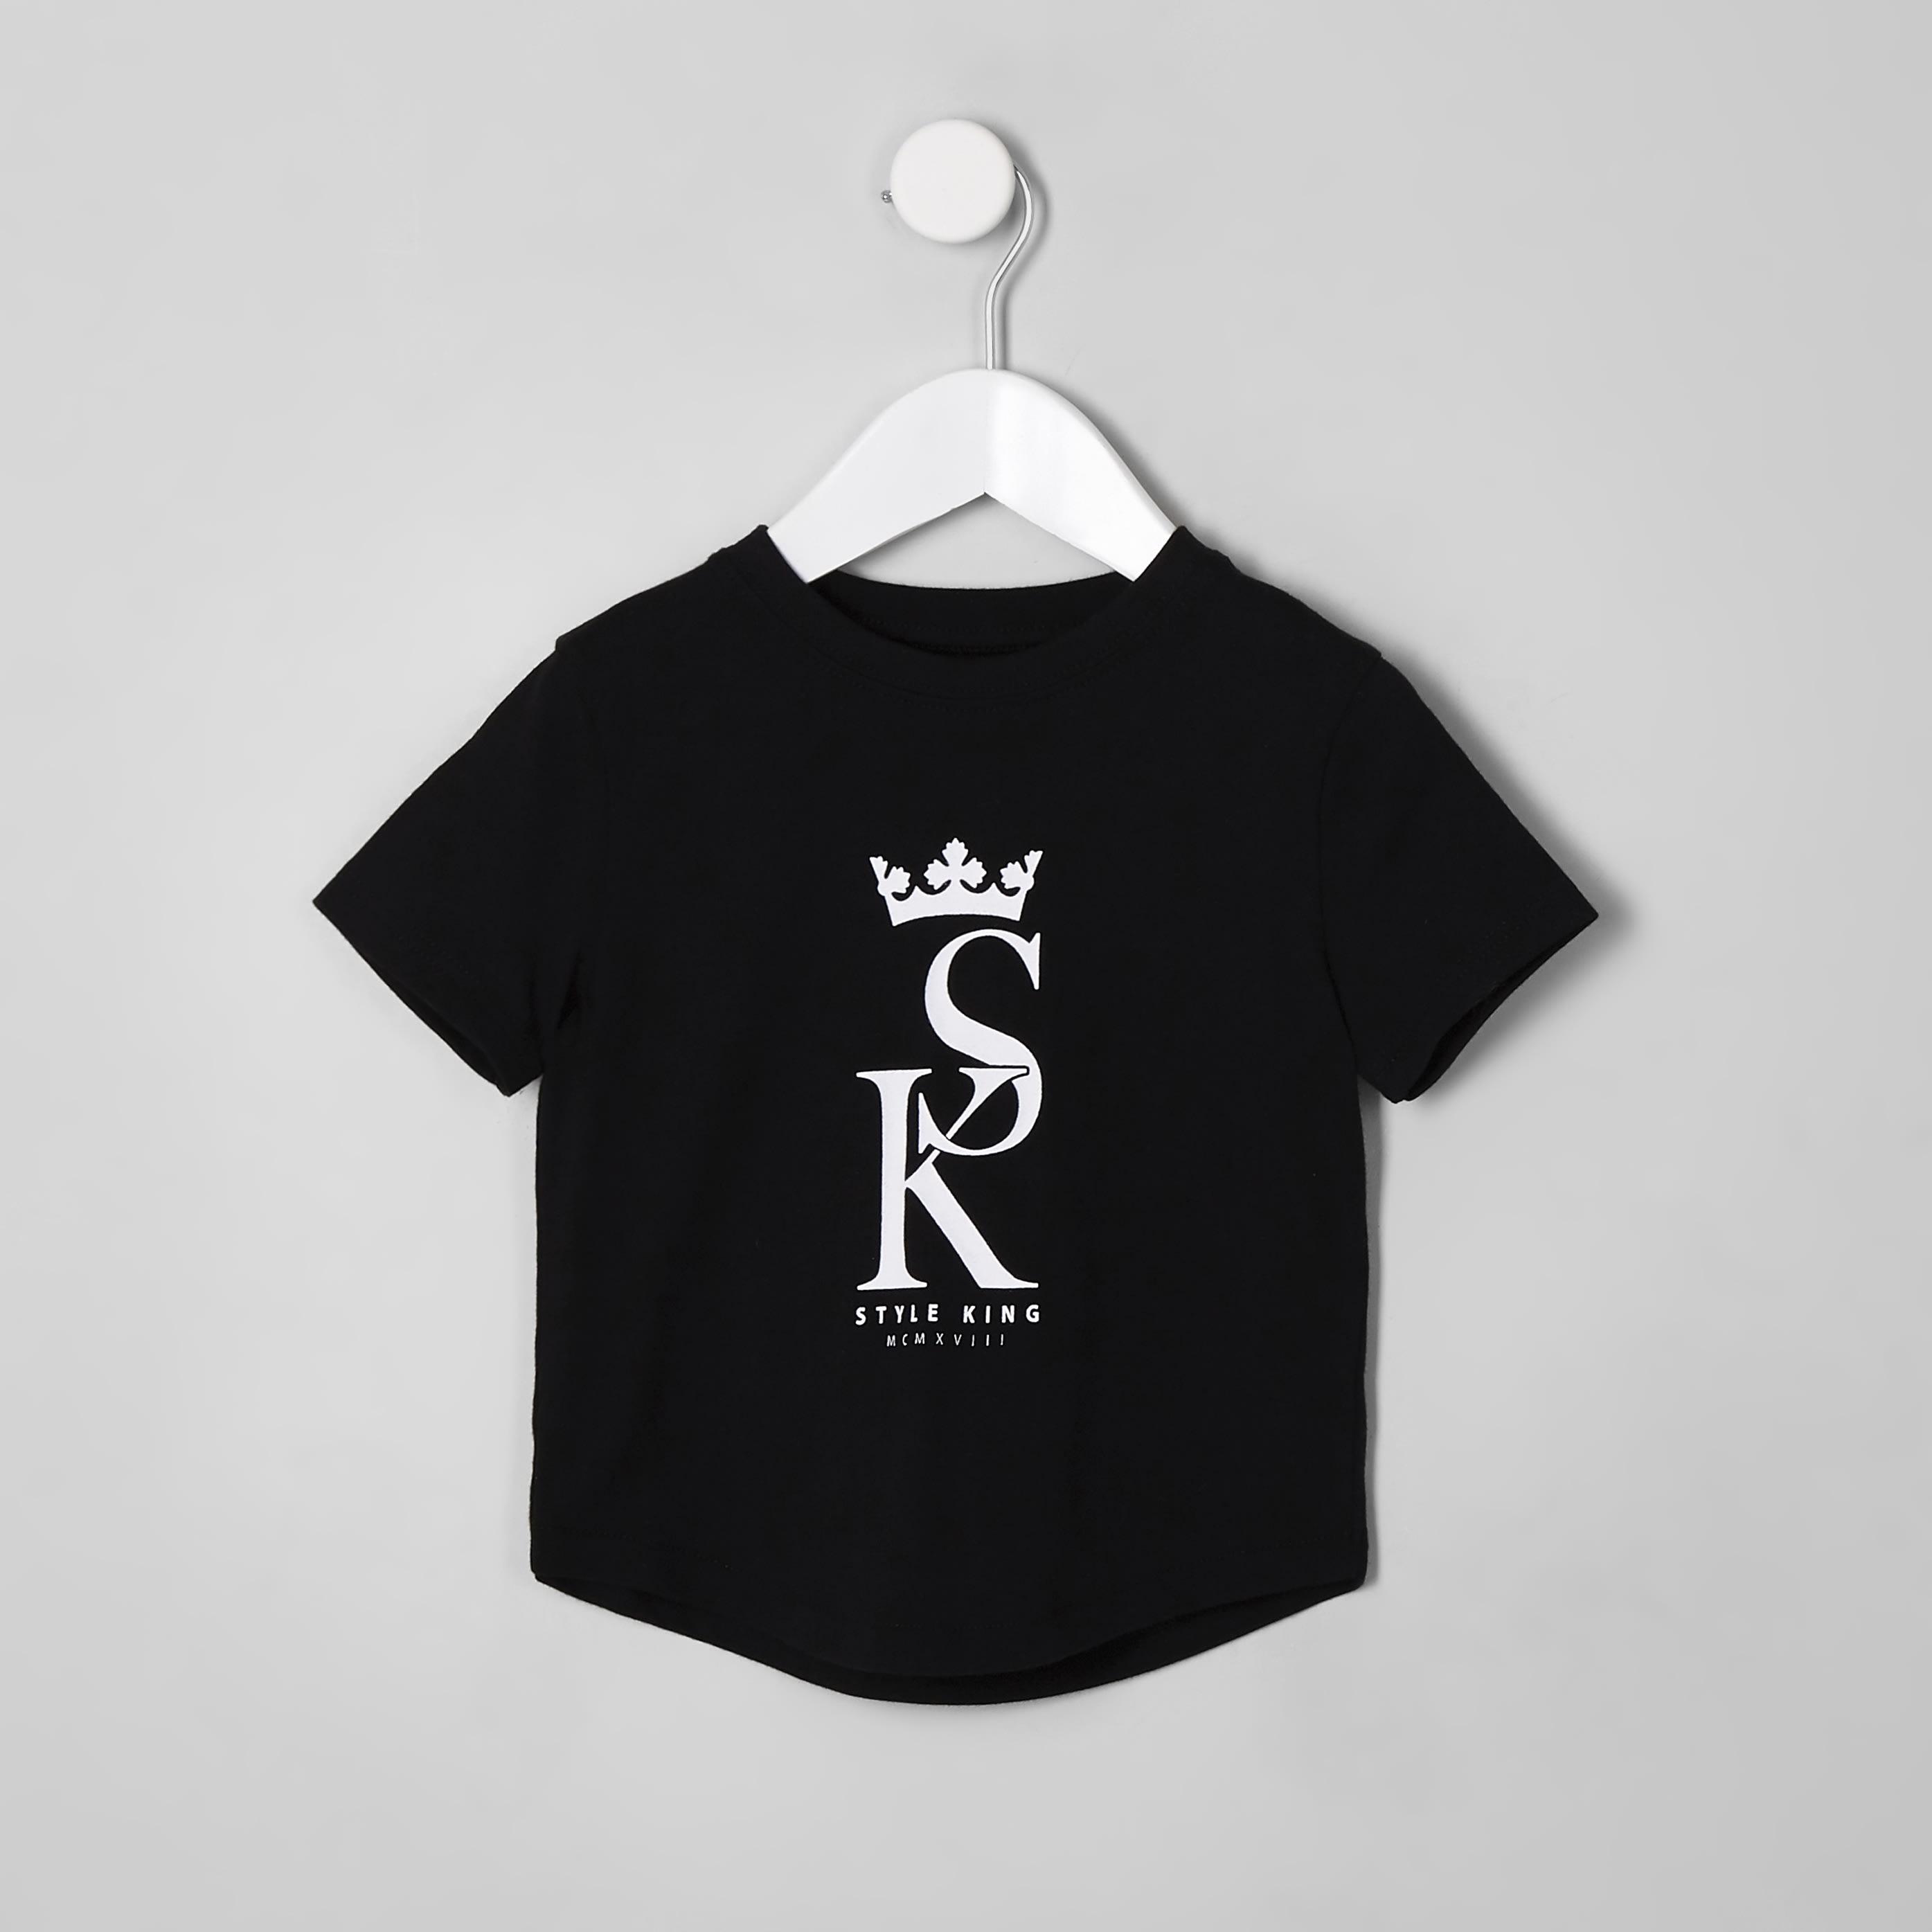 River Island Mens Baby Boys Black 'style king' T-shirt (9-12 Mths)